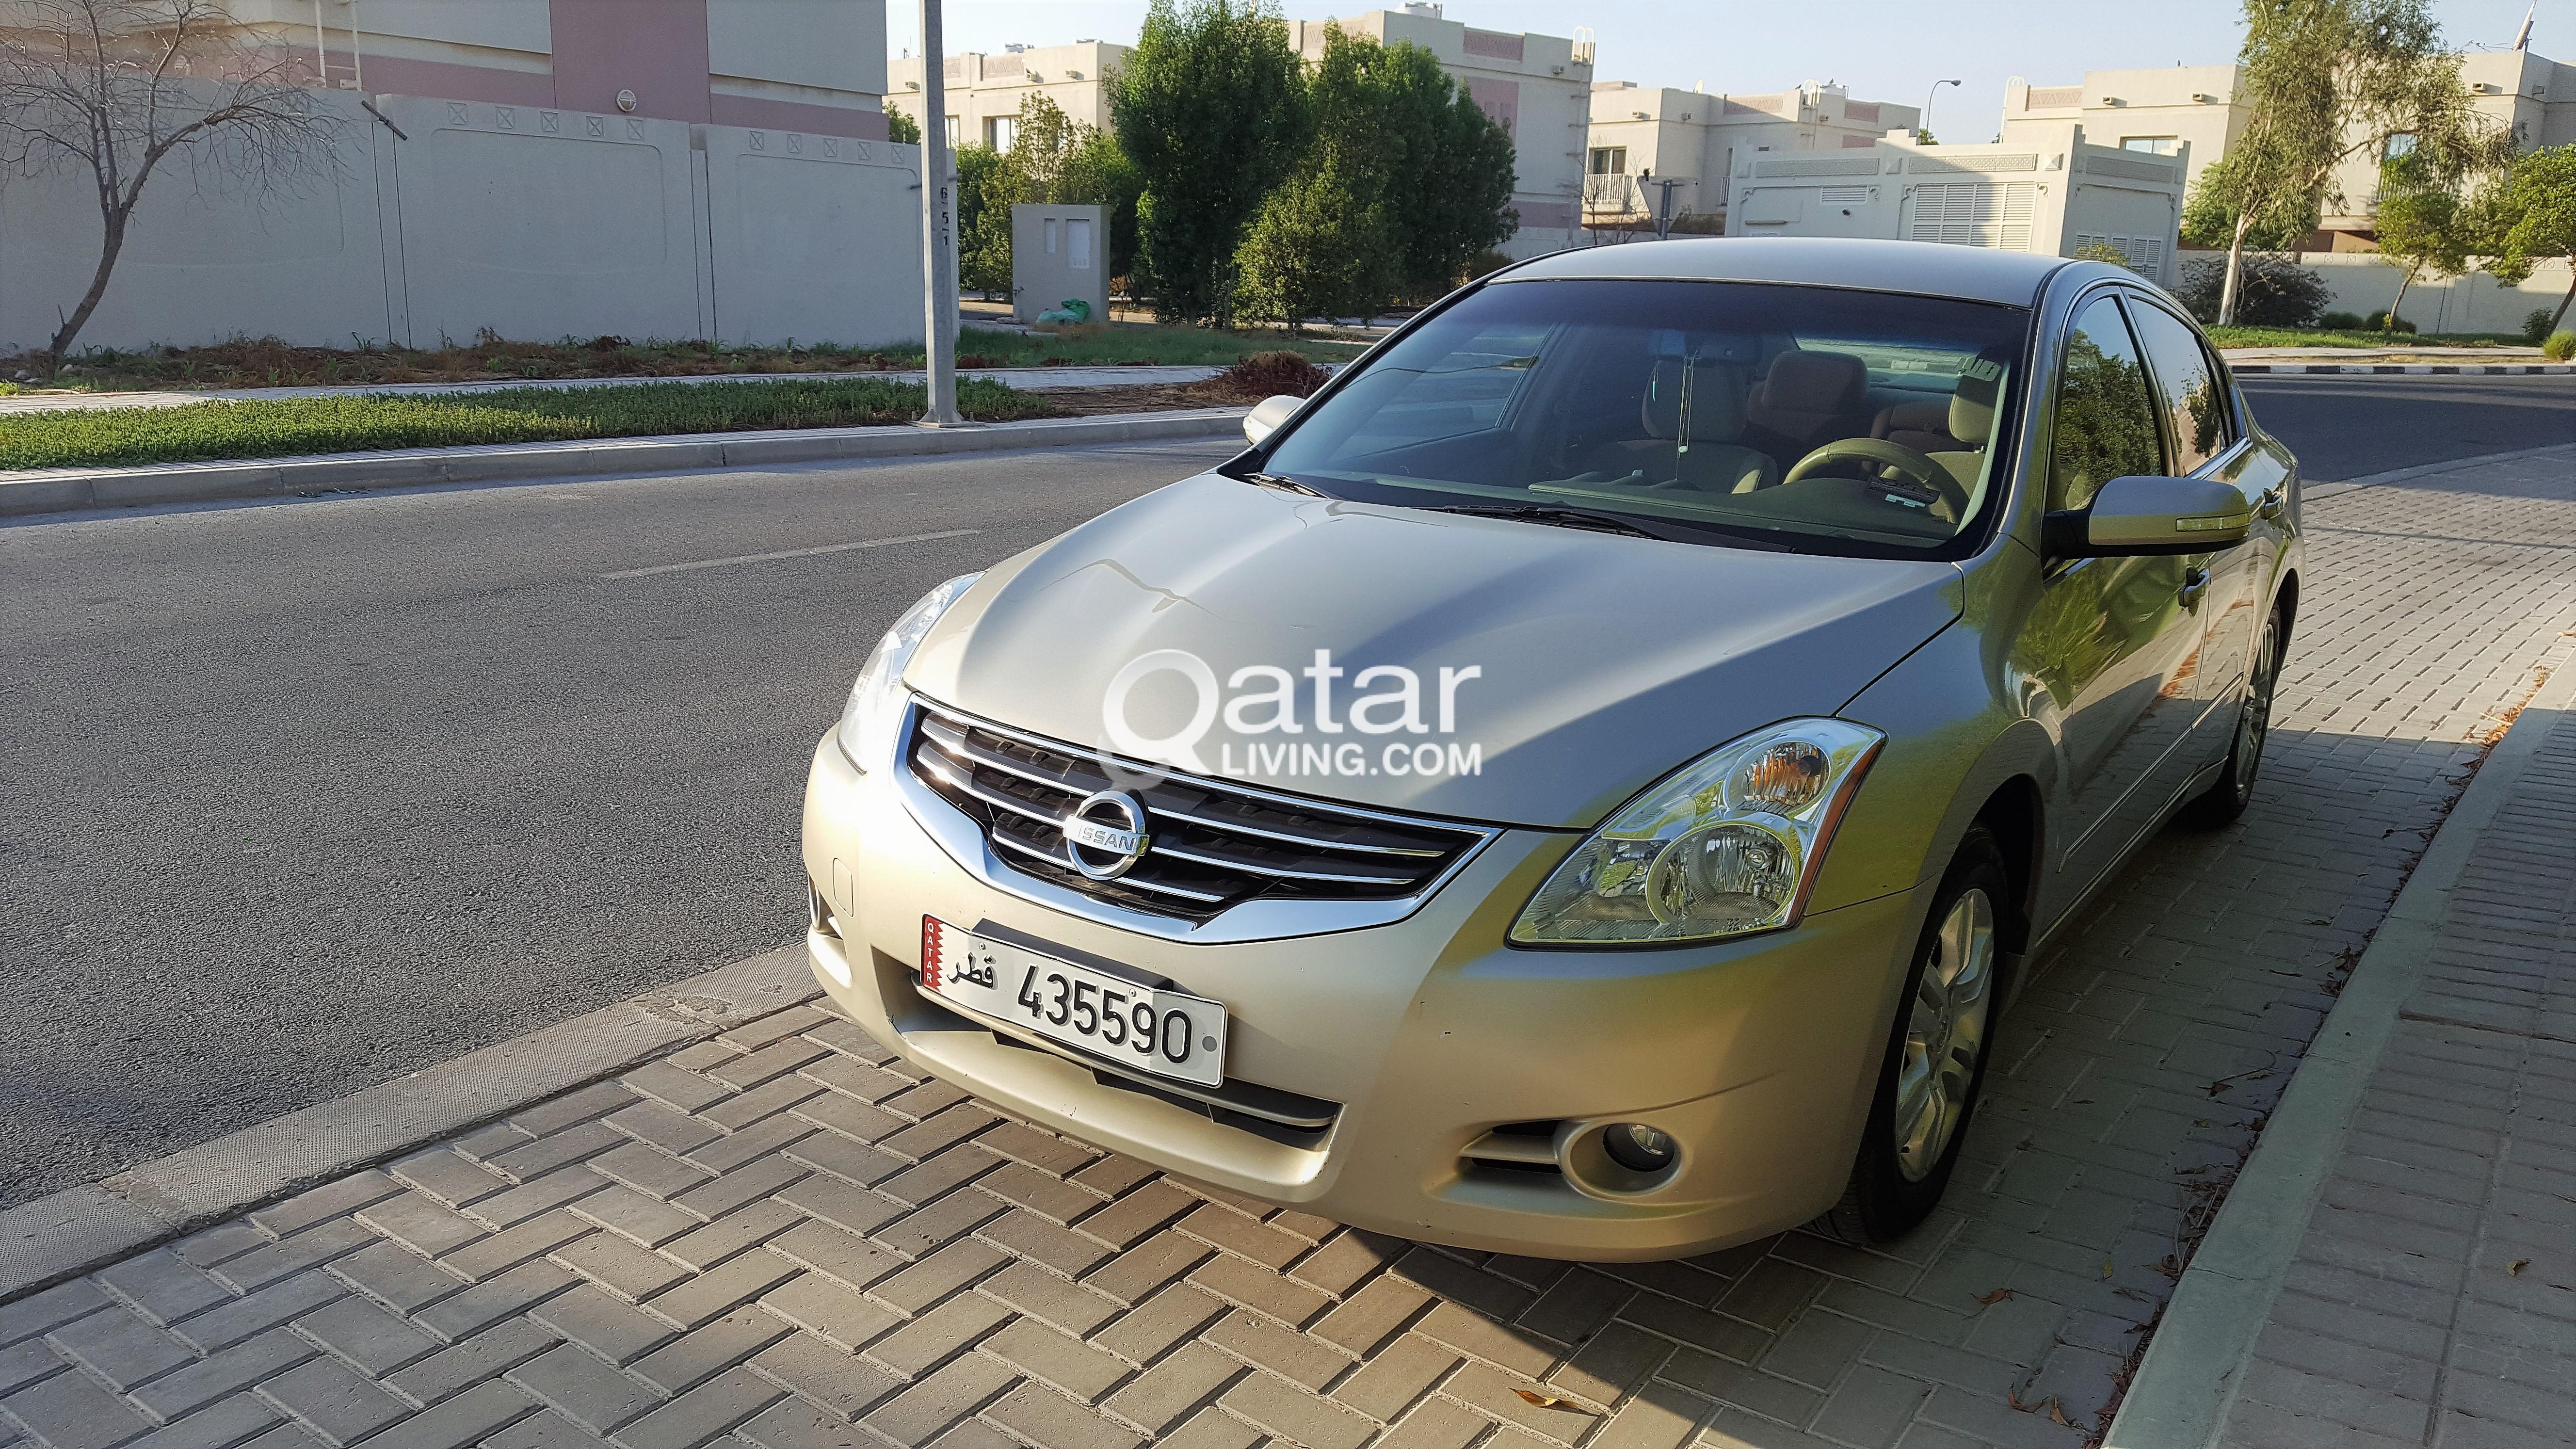 vehicles advert sale nissan living title carsedan qatar altima for